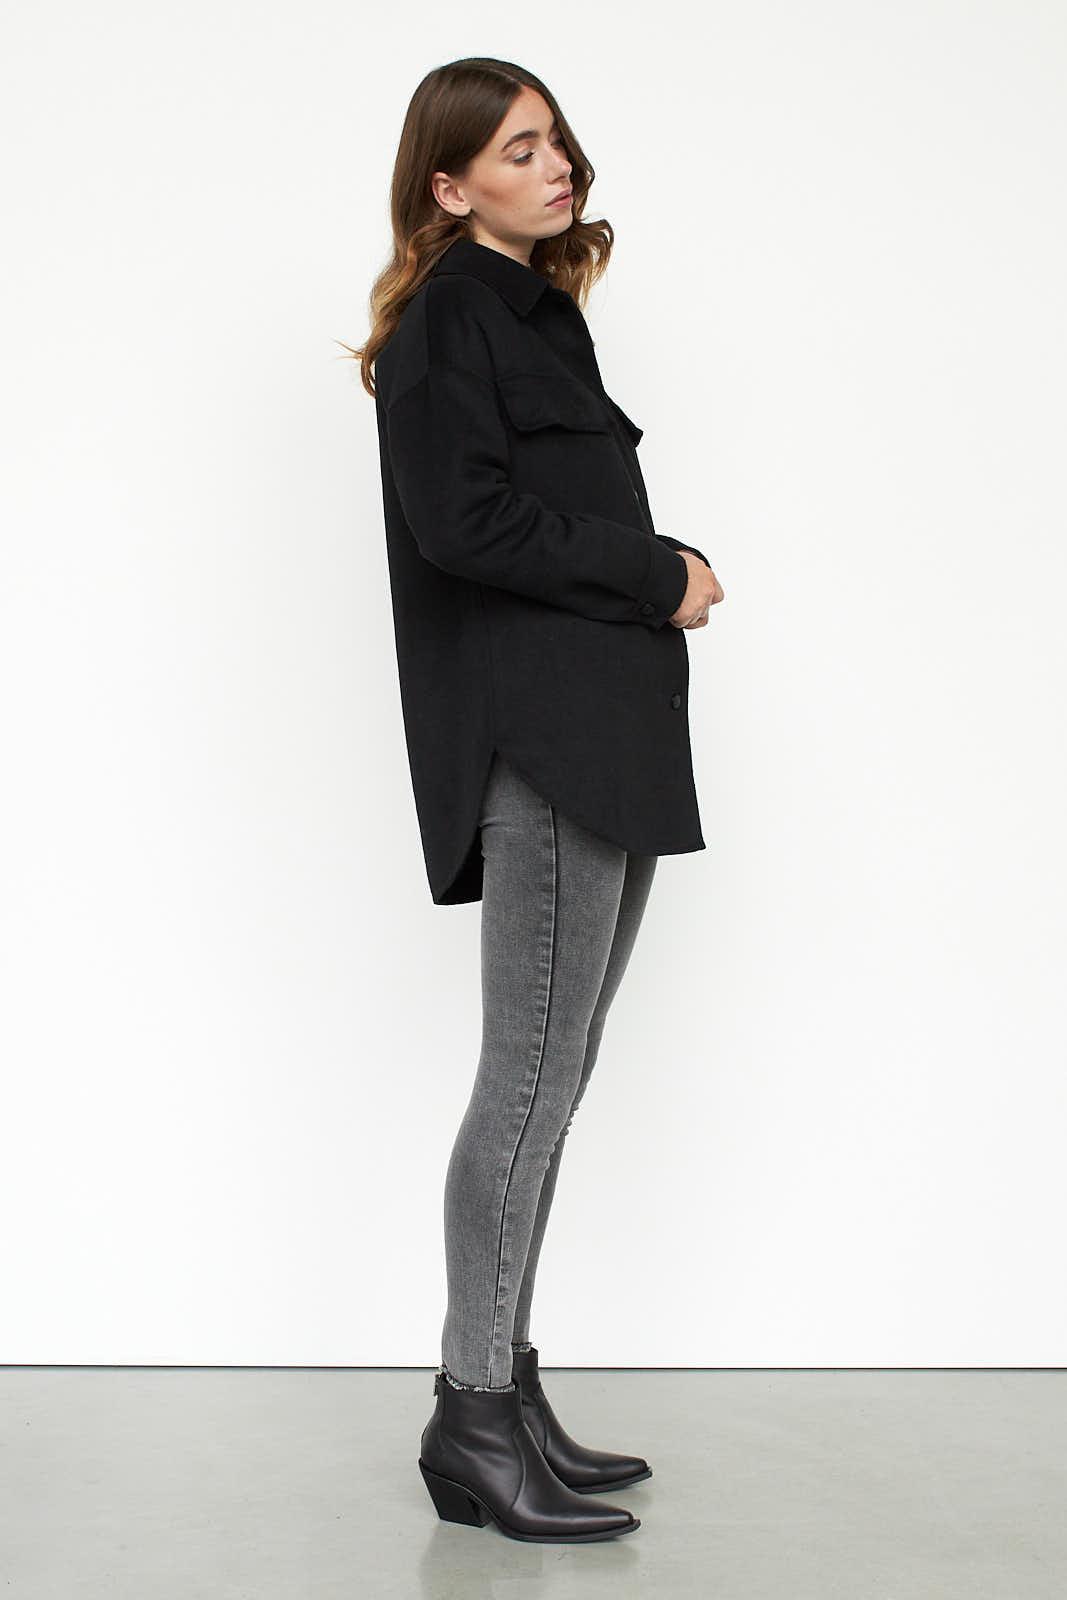 Danielle shirt jacket sideview